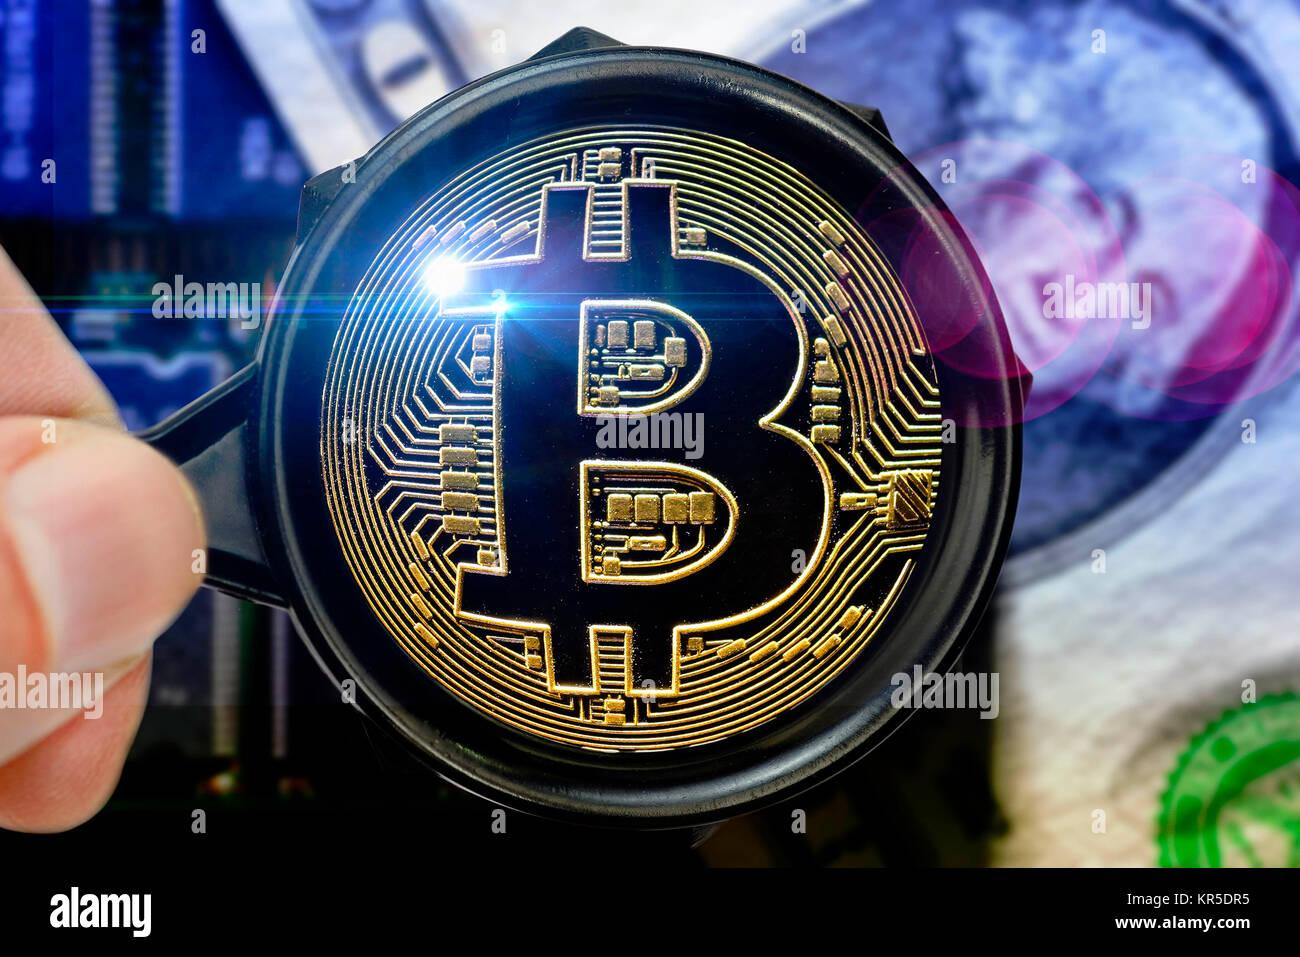 Coin with Bitcoin sign under the magnifying glass, Münze mit Bitcoin-Zeichen unter der Lupe Stock Photo